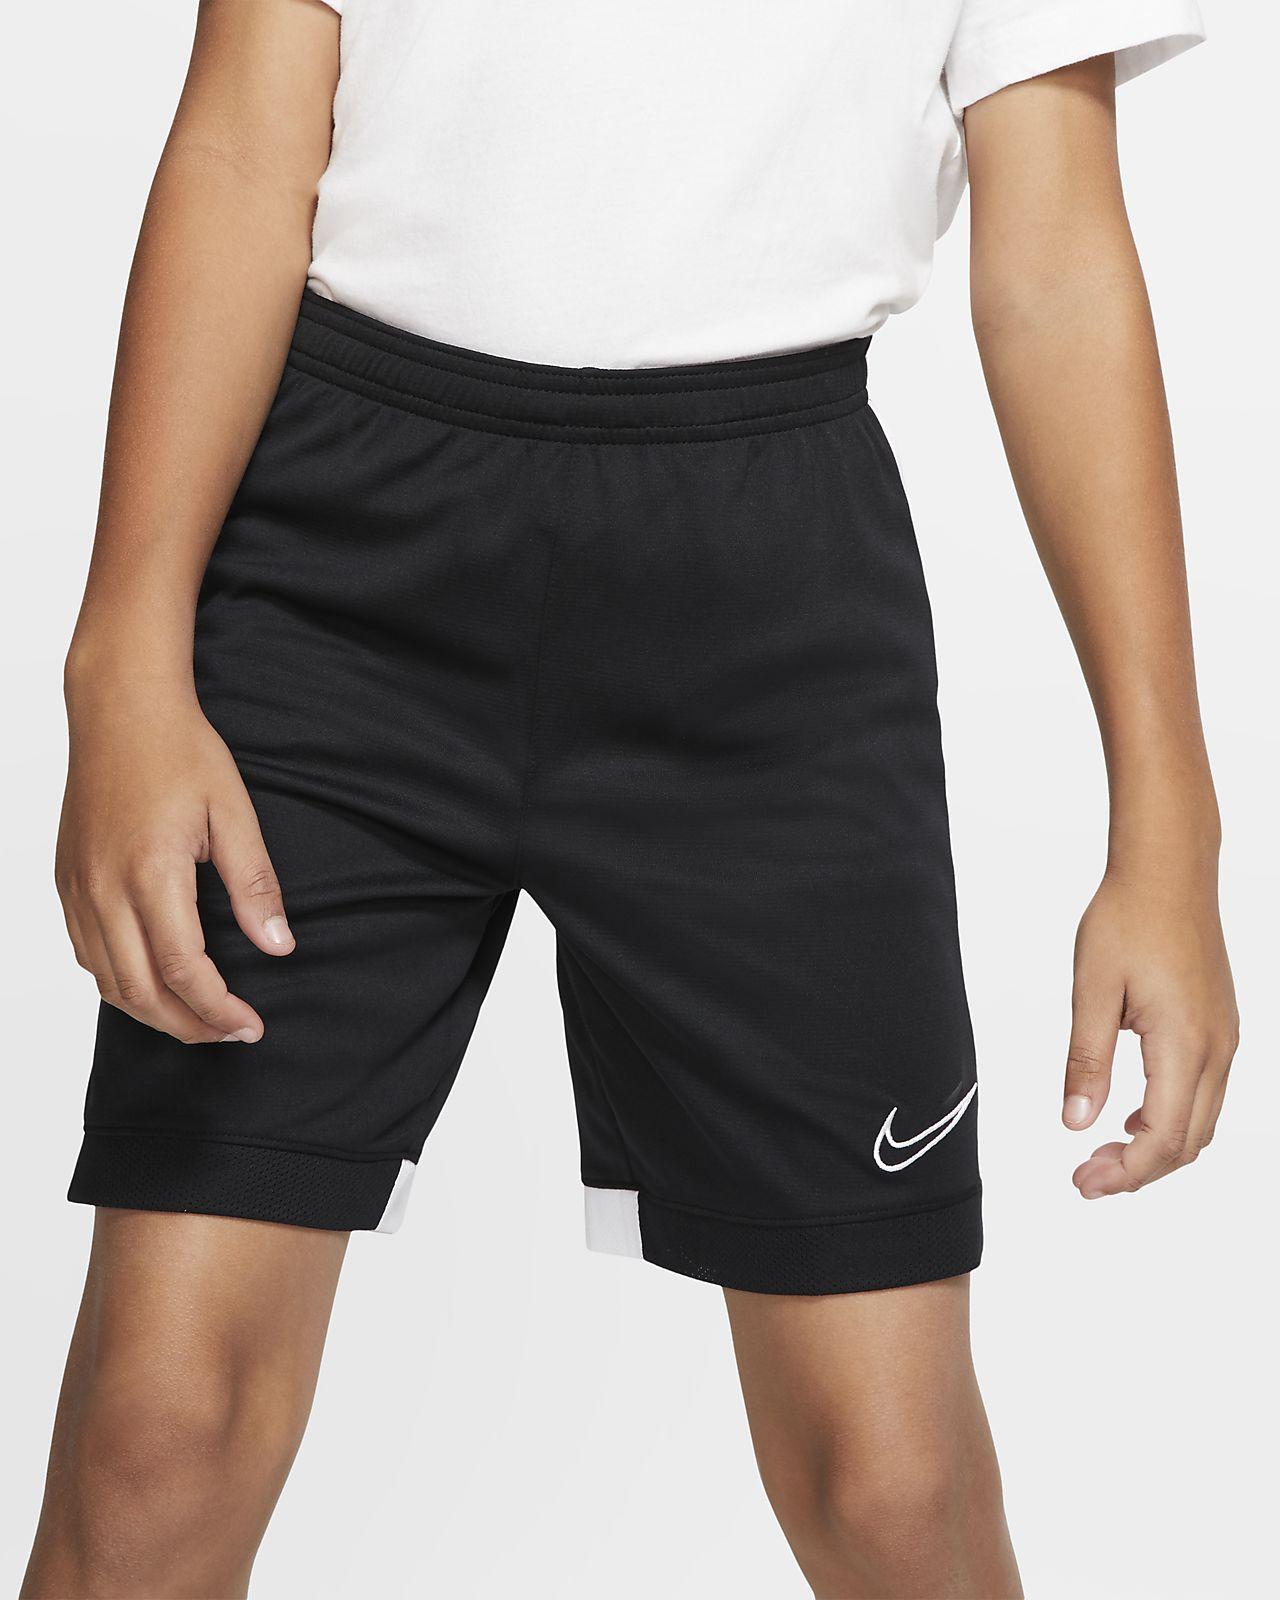 Nike Dri-FIT Academy大童(男孩)足球短裤